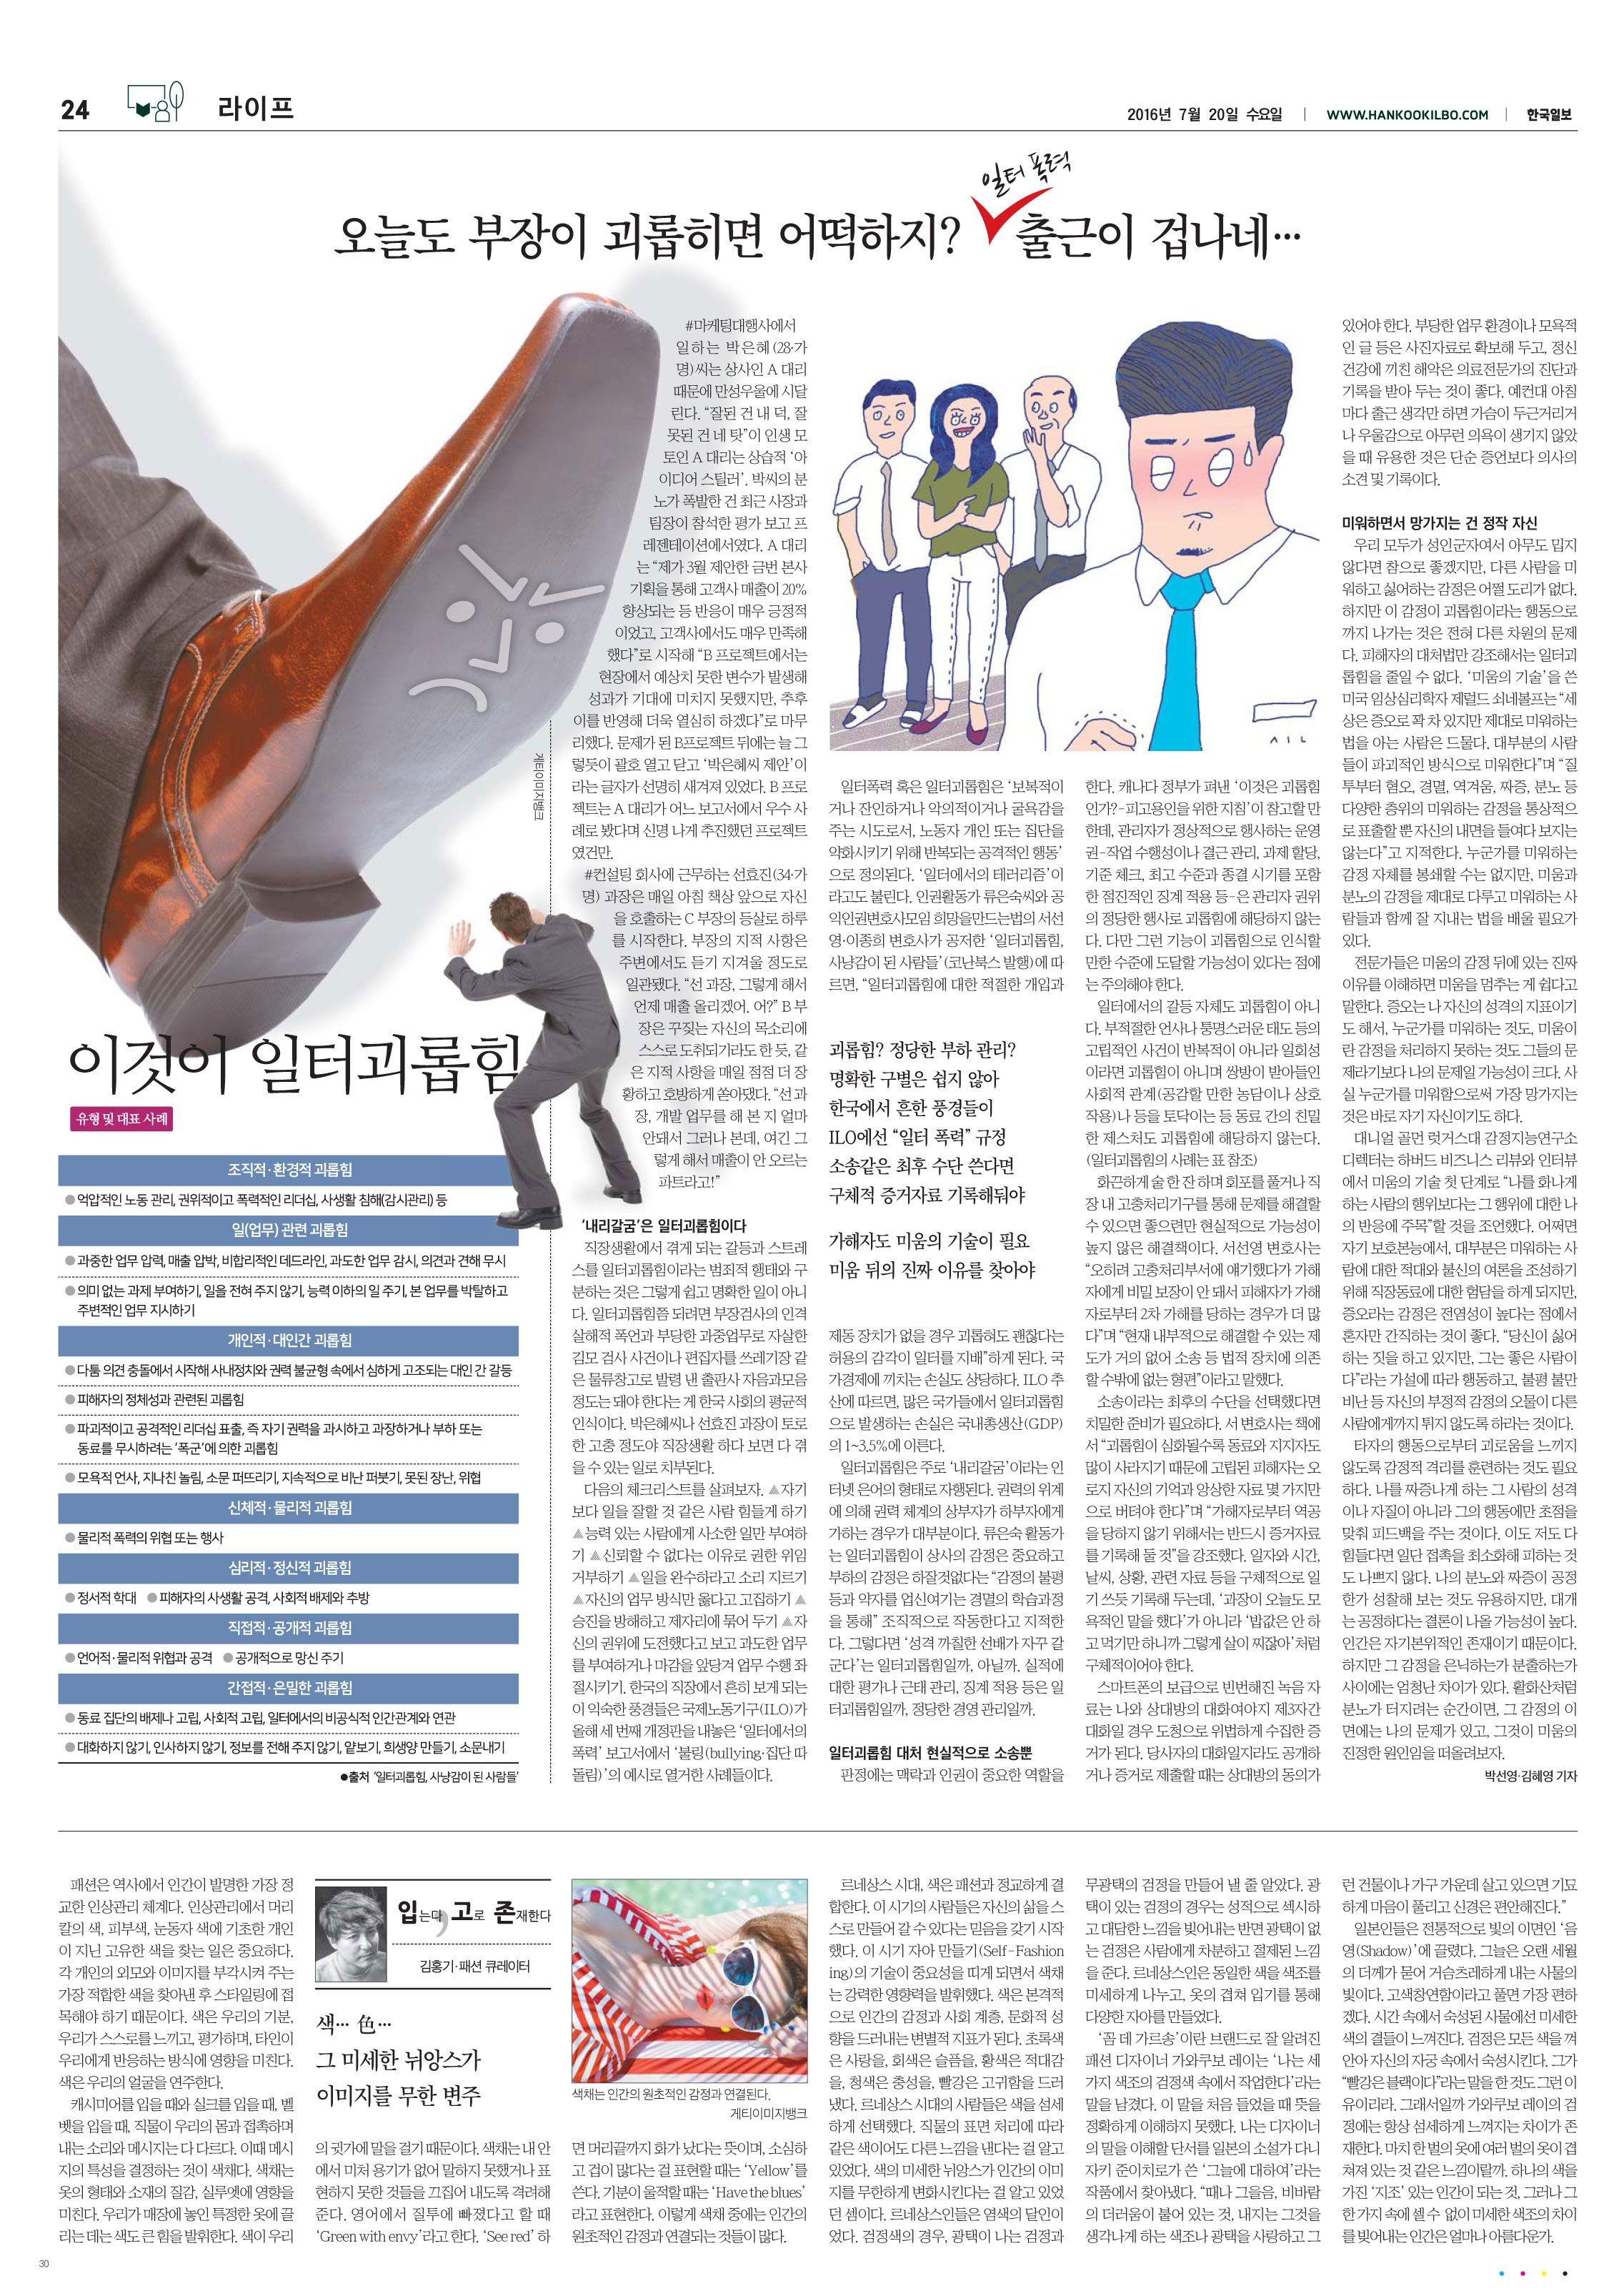 newspaper 일터괴롭힘